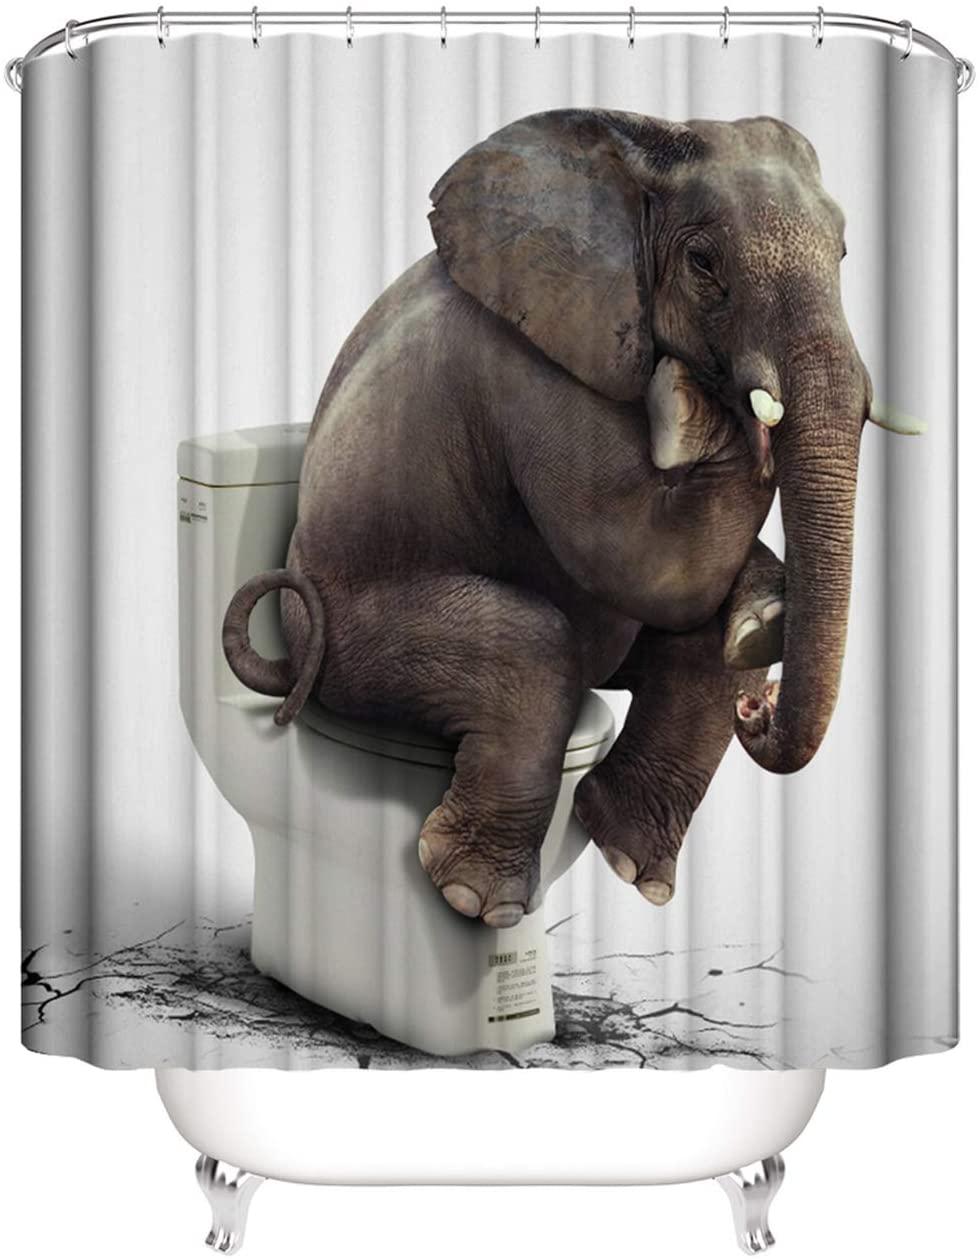 Elephant Shower Curtain Funny Indian Elephant Sitting on Toilet Design Kids Animal Shower Curtains for Bathroom 70.86x70.86 Inch Waterproof Fabric Bathroom Decor with Hooks-Toilet elephant